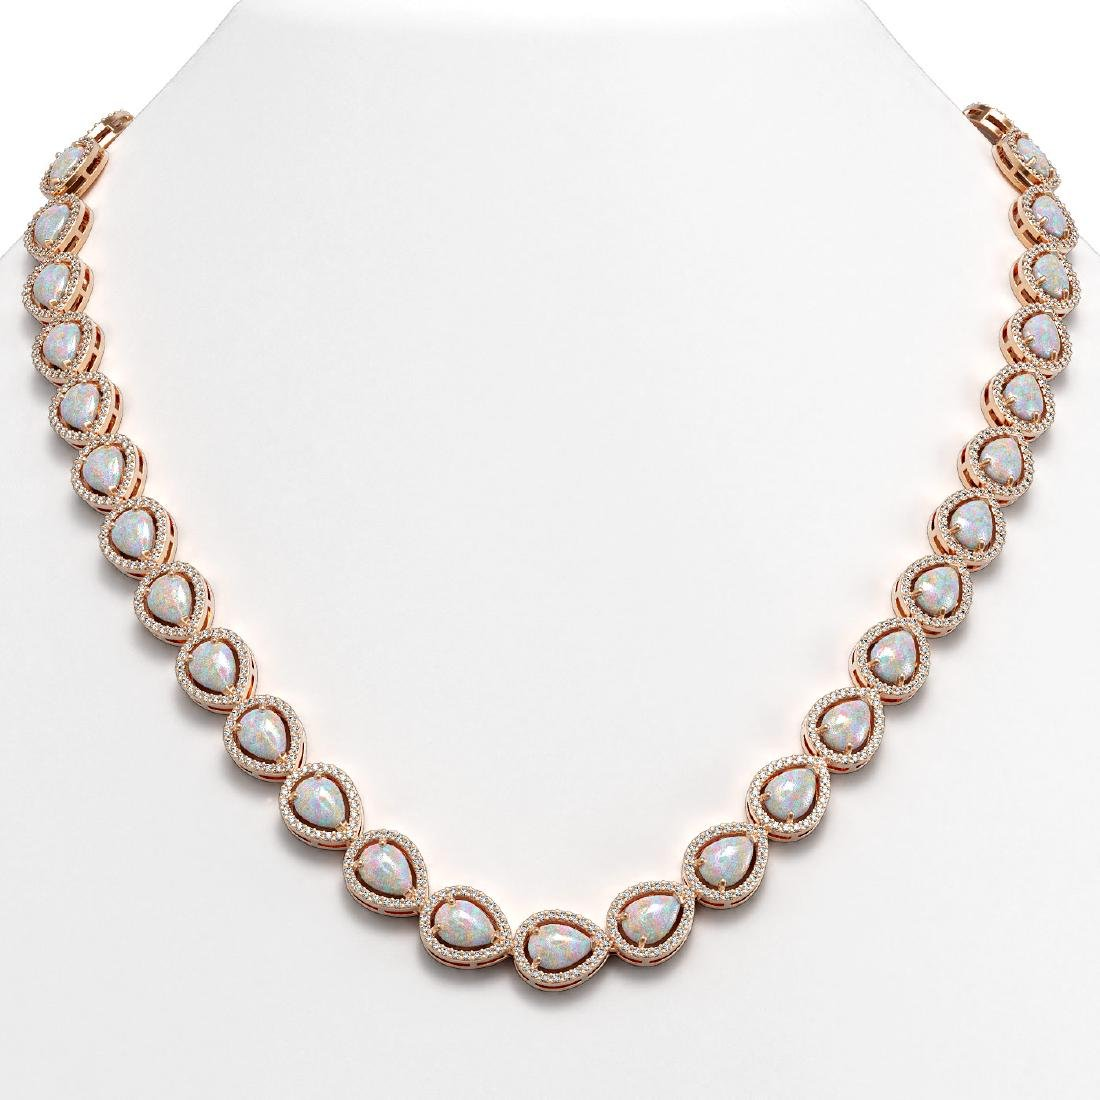 27.93 CTW Opal & Diamond Halo Necklace 10K Rose Gold